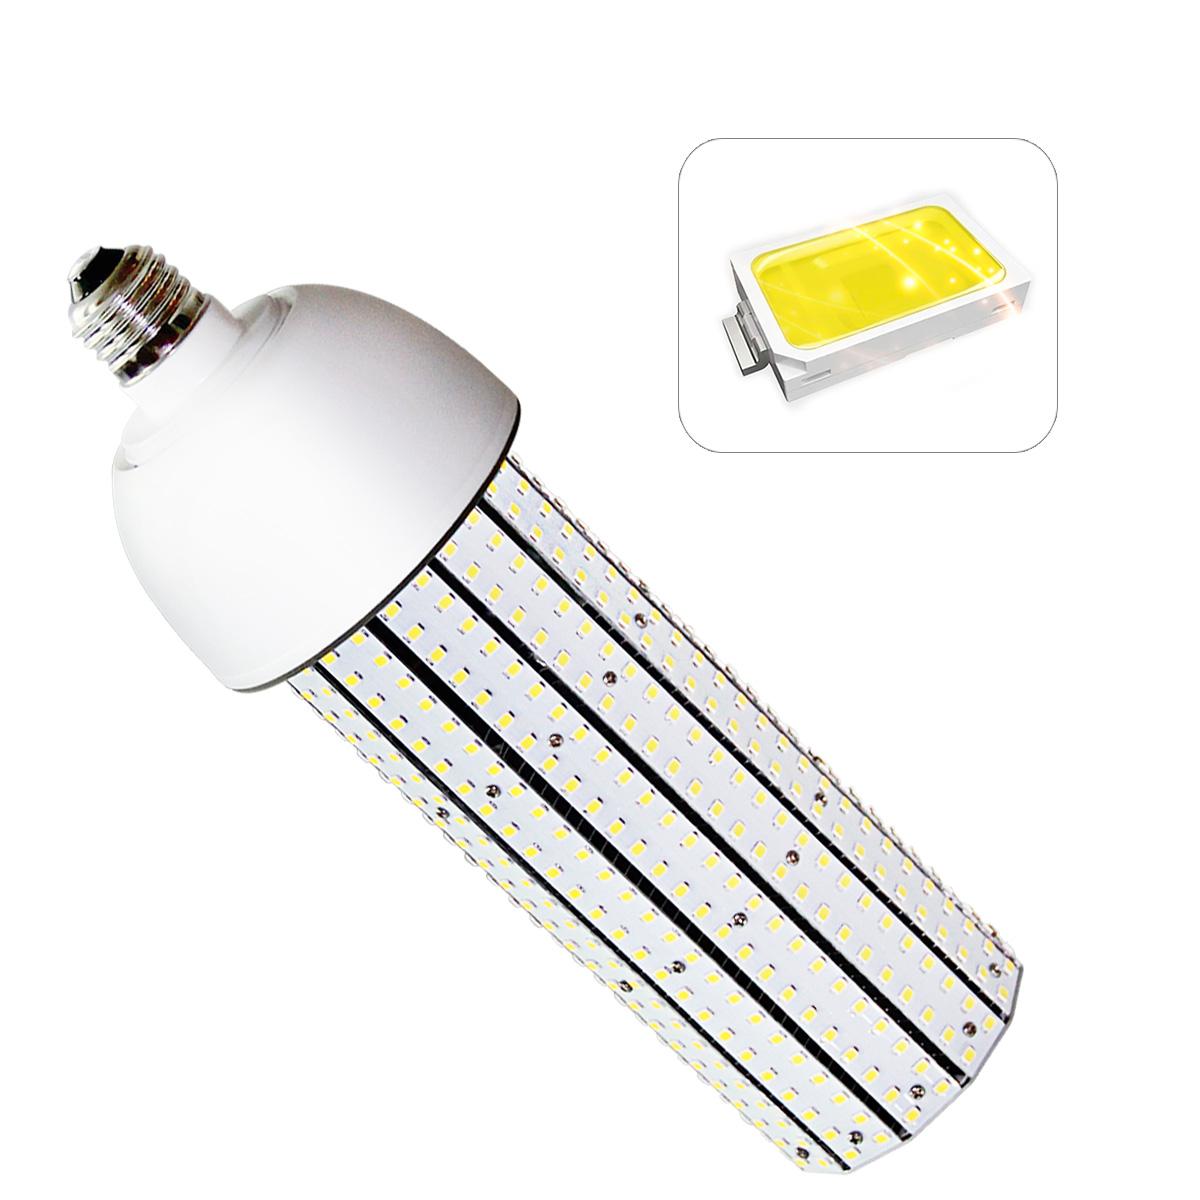 Kawell 60w led corn light bulb e39 large mogul base led commercial kawell 60w led corn light bulb e39 large mogul base led commercial retrofit bulb for fixtures aloadofball Gallery